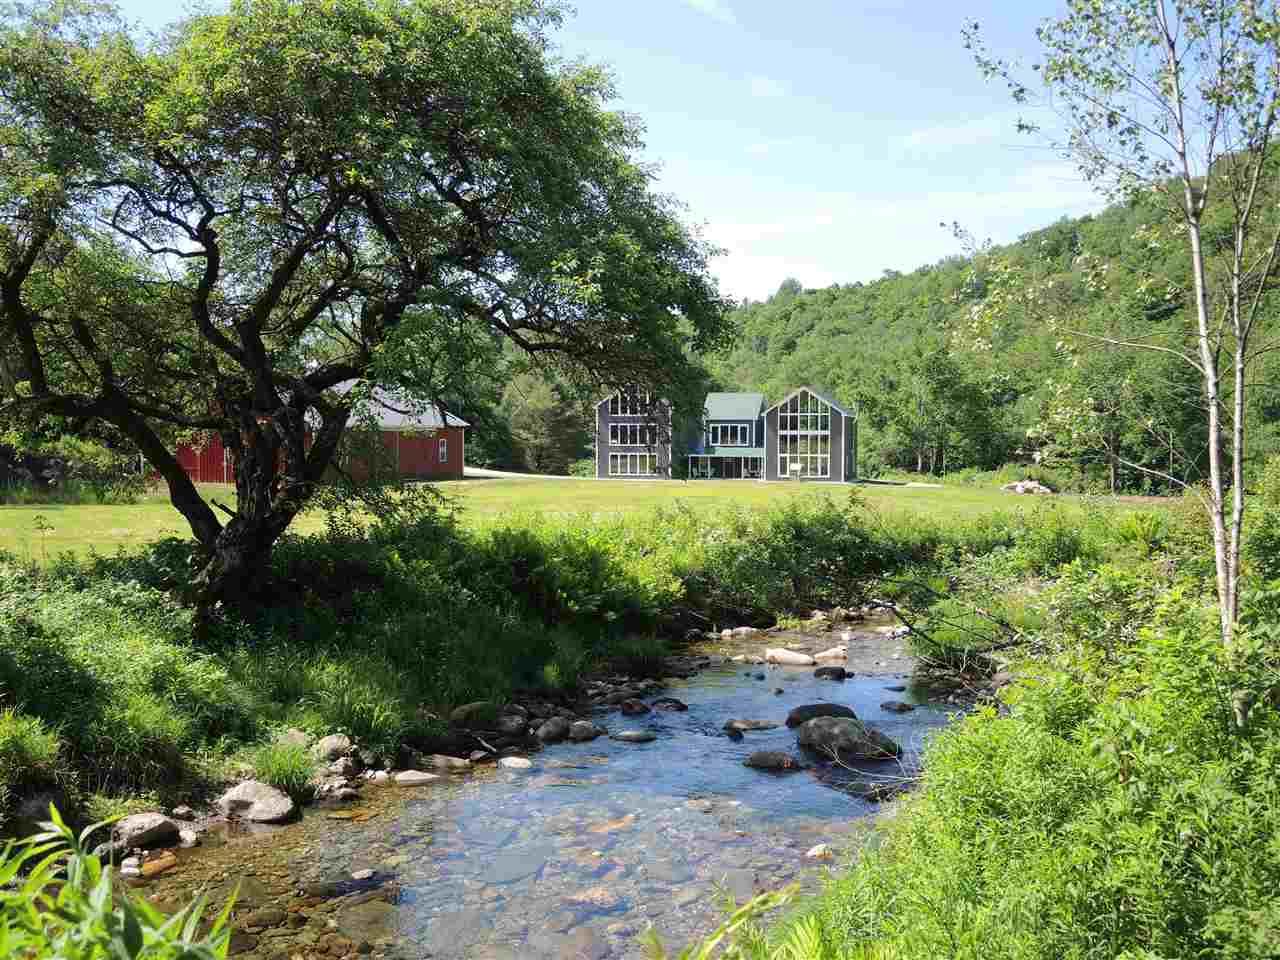 Chittenden VTHorse Farm | Property  on Halpin/Steam Mill Brook